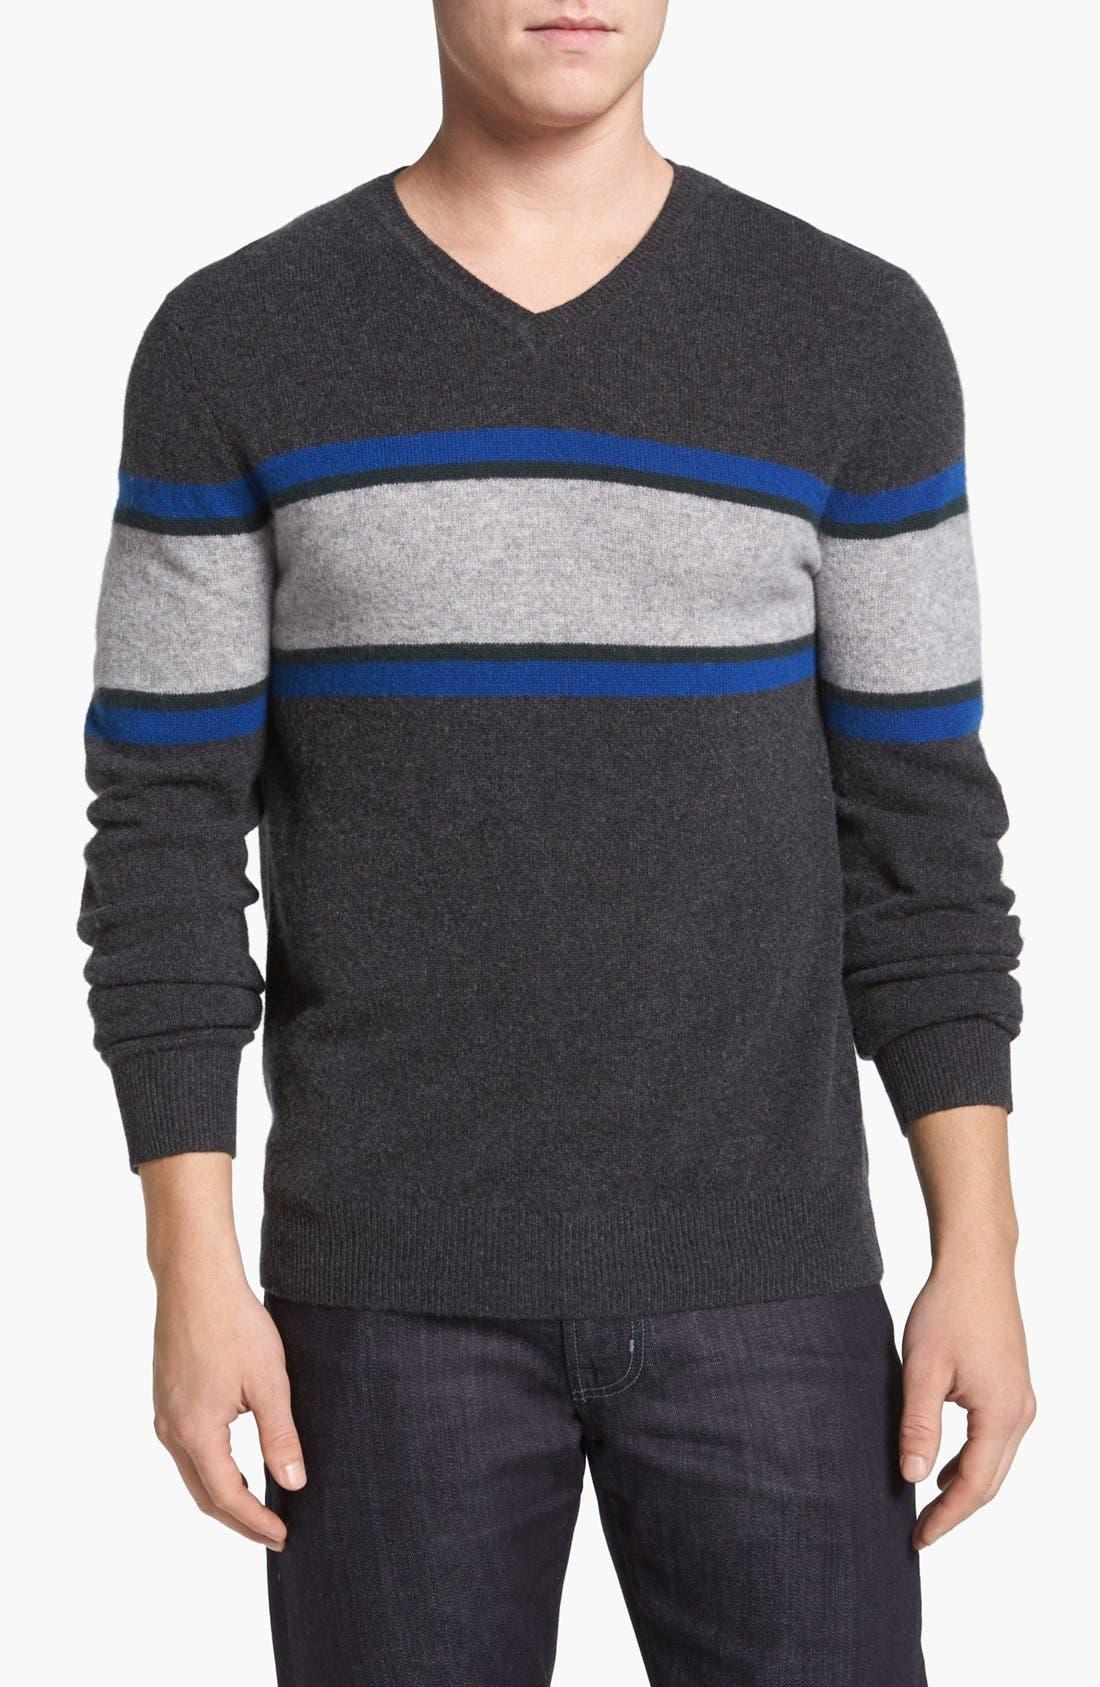 Alternate Image 1 Selected - 1901 Cashmere V-Neck Sweater